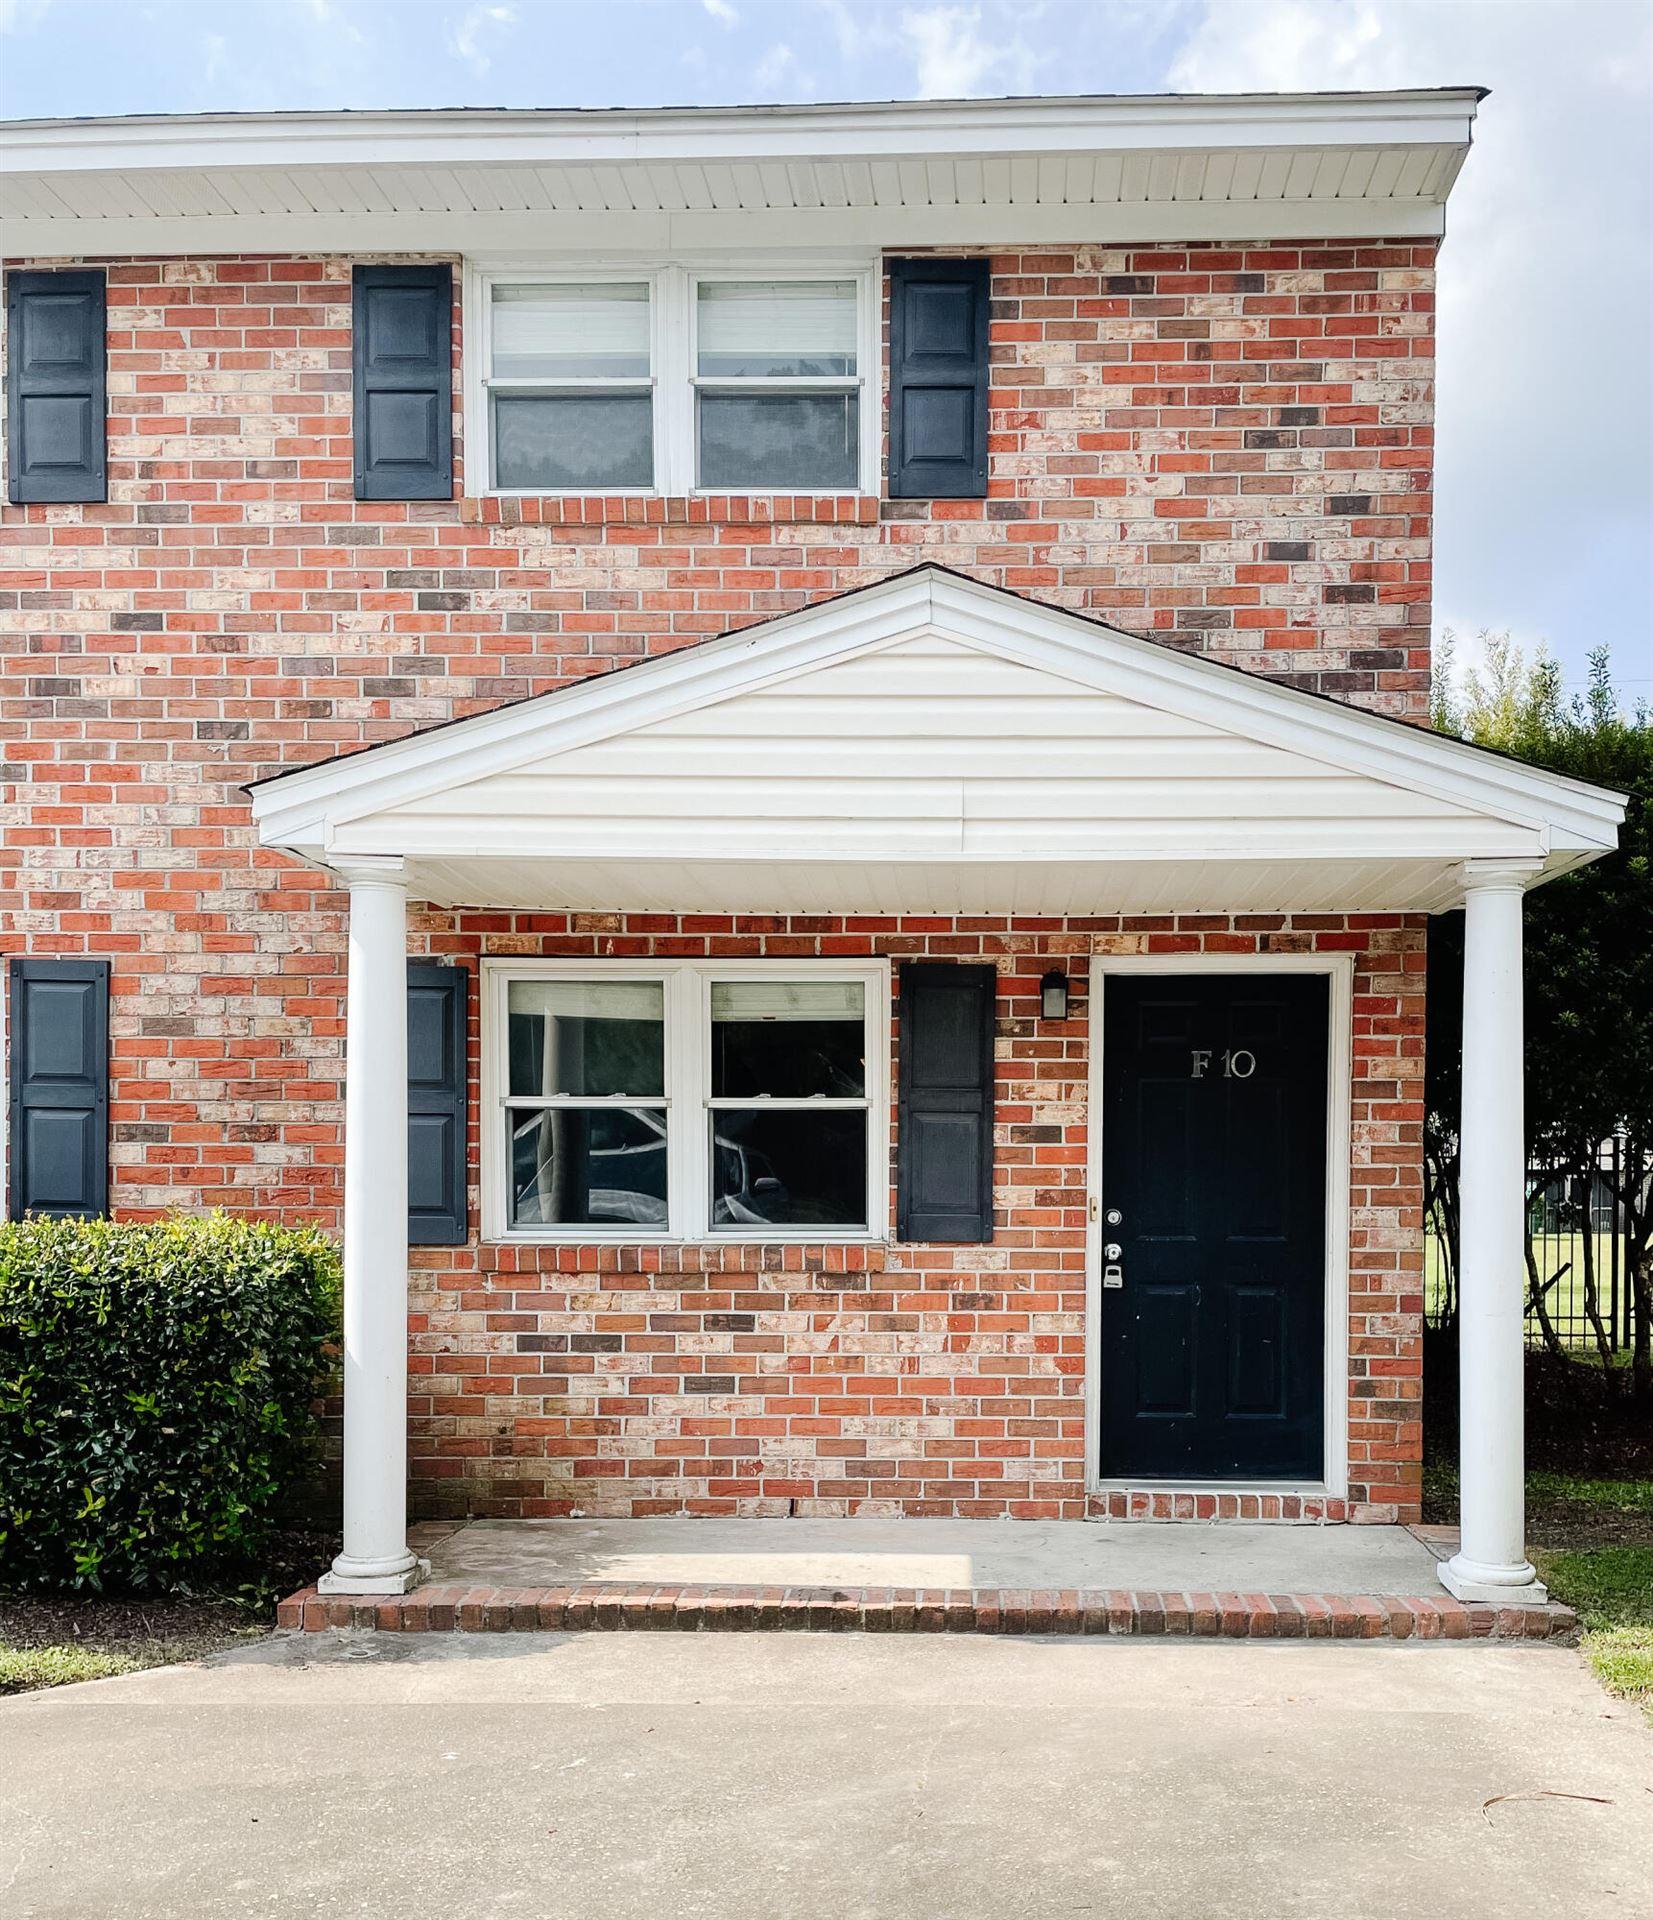 1852 Mepkin Road #F10, Charleston, SC 29407 - #: 21025727